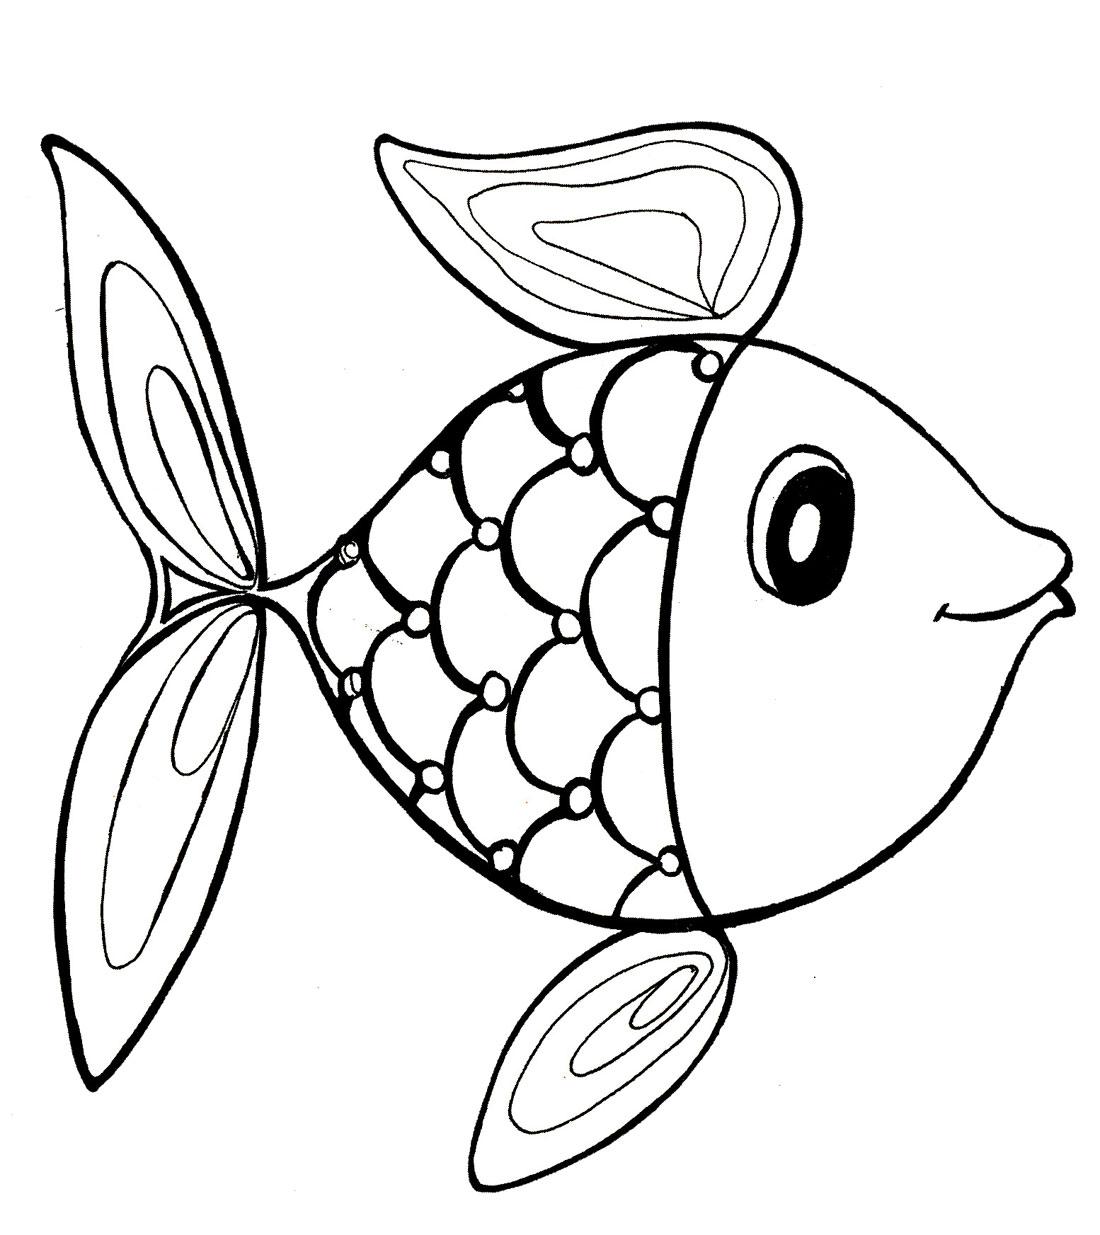 Раскраска. Рыбка: http://razdeti.ru/photos/photo414.html